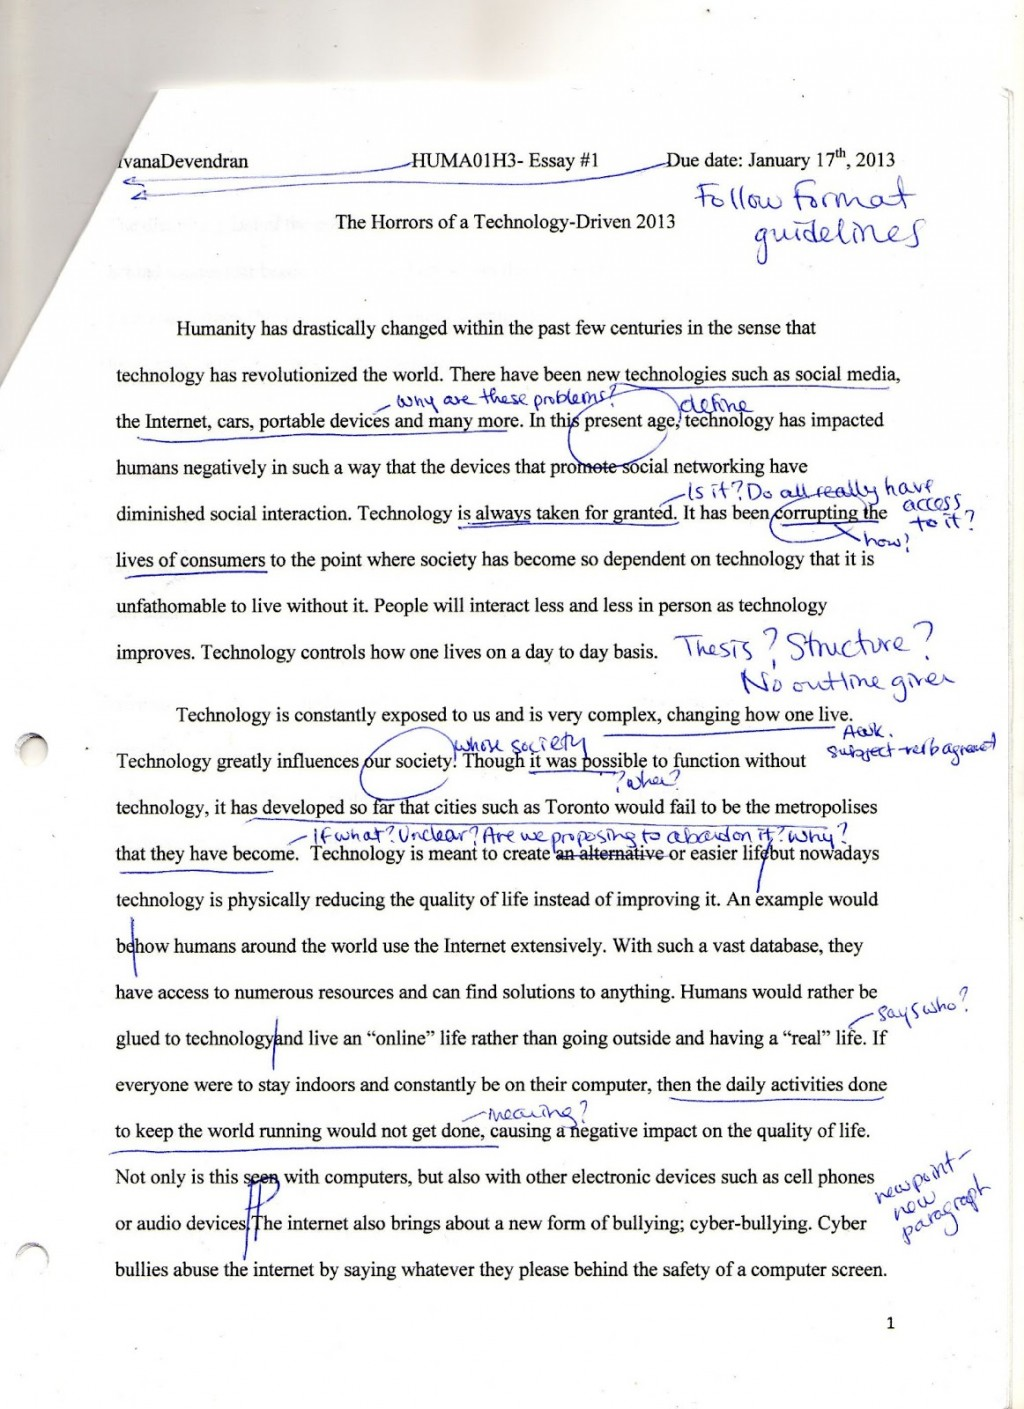 006 Cyber Bullying Argumentative Essay Topics Free Professional Resume I Writing Cyberbullying Example Impressive Essays Large